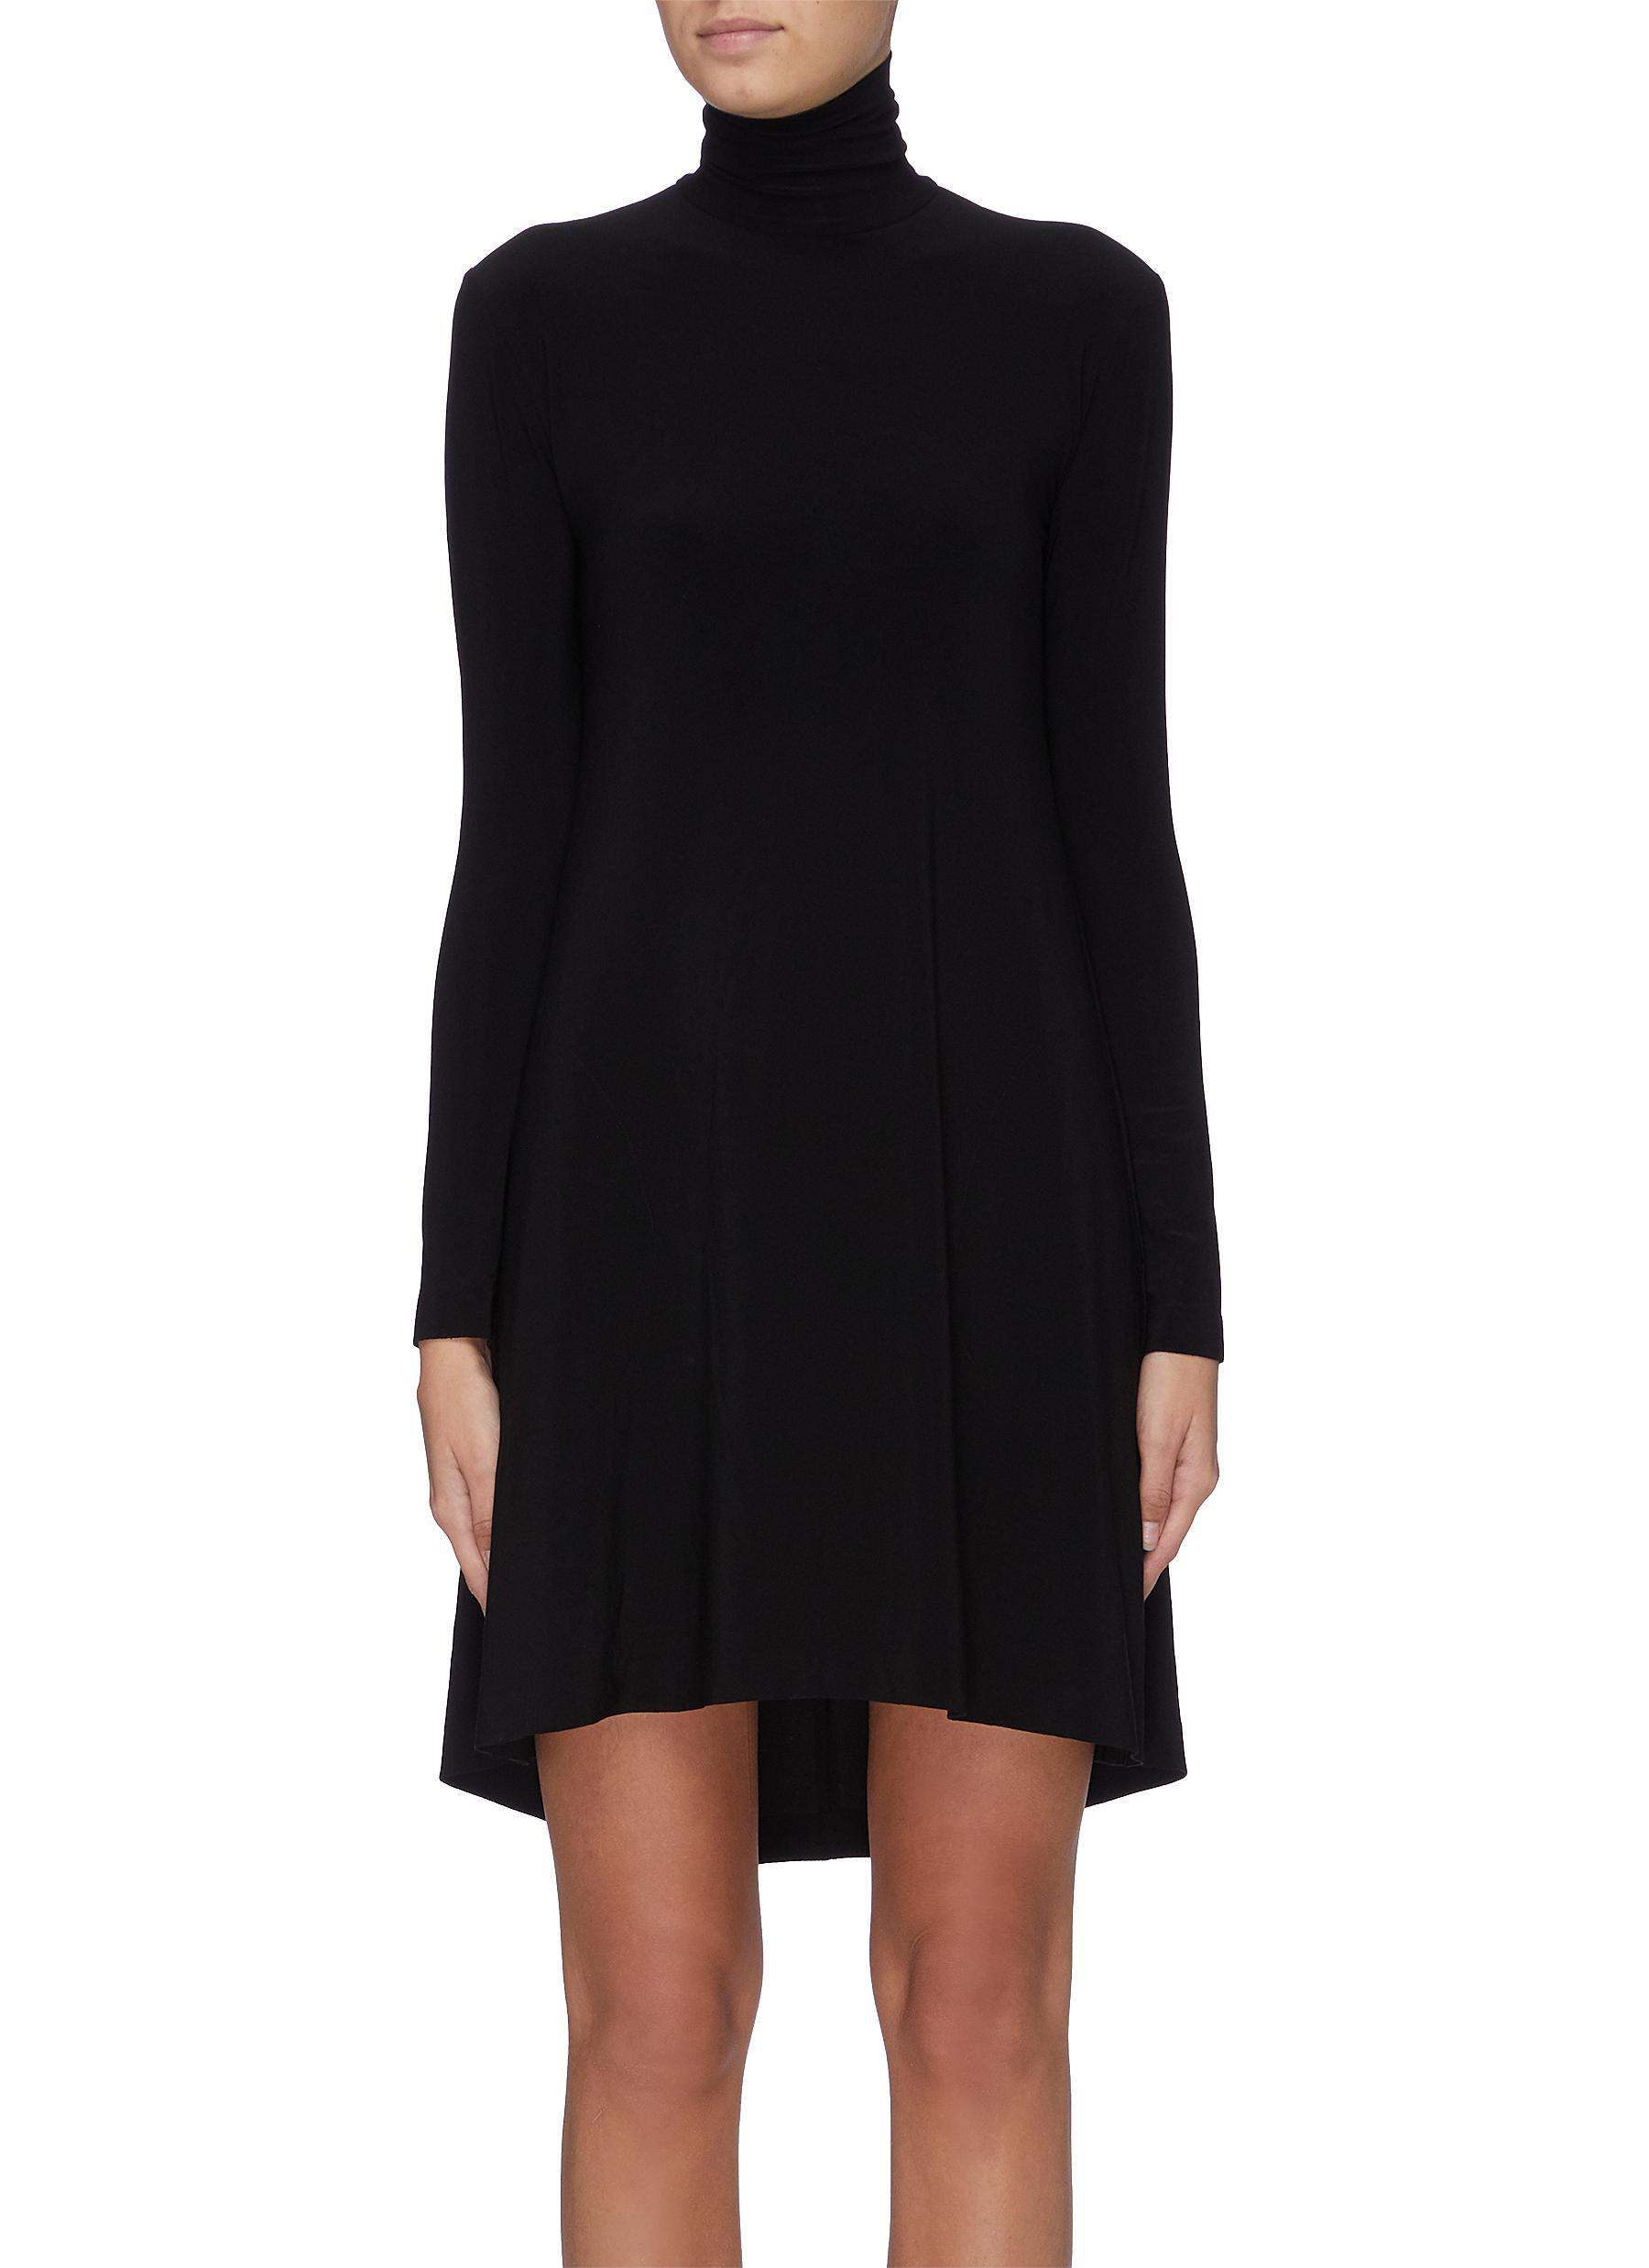 Long sleeve turtleneck dress by Norma Kamali